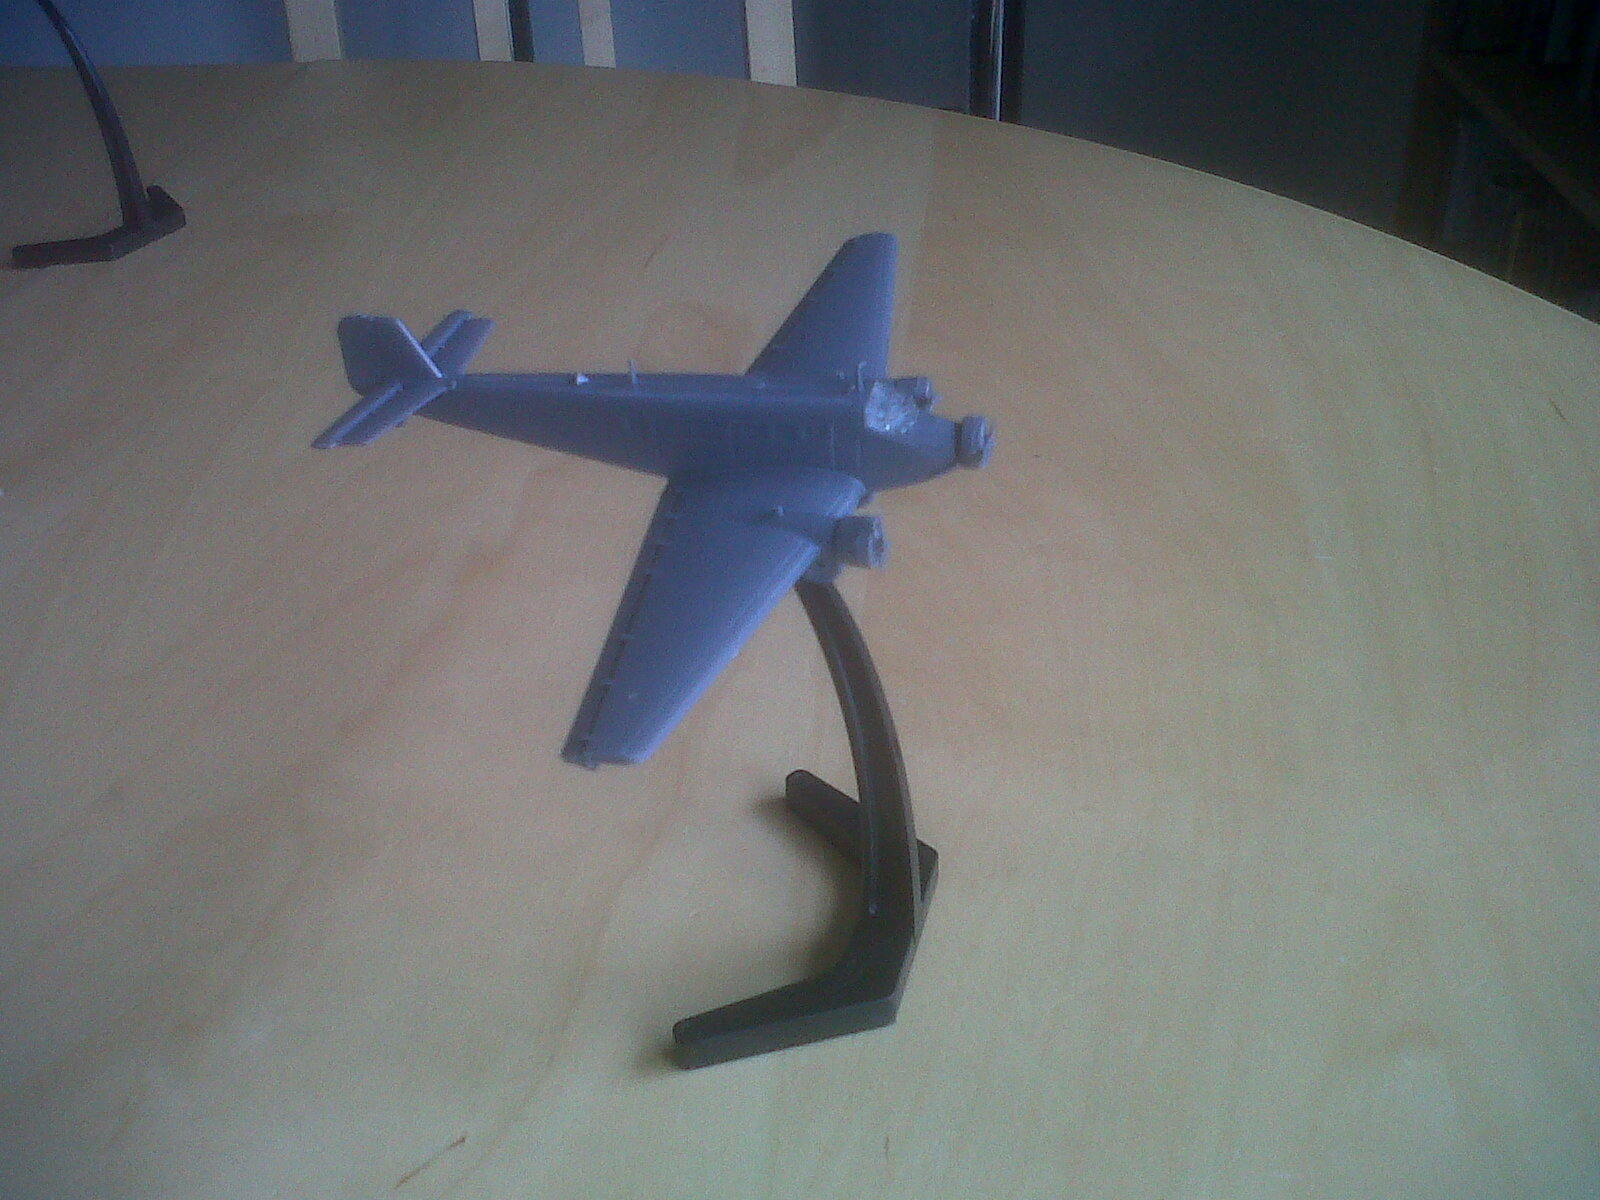 Geordie's Big Battles: Just Putting Plastic Things Together (WWII 1